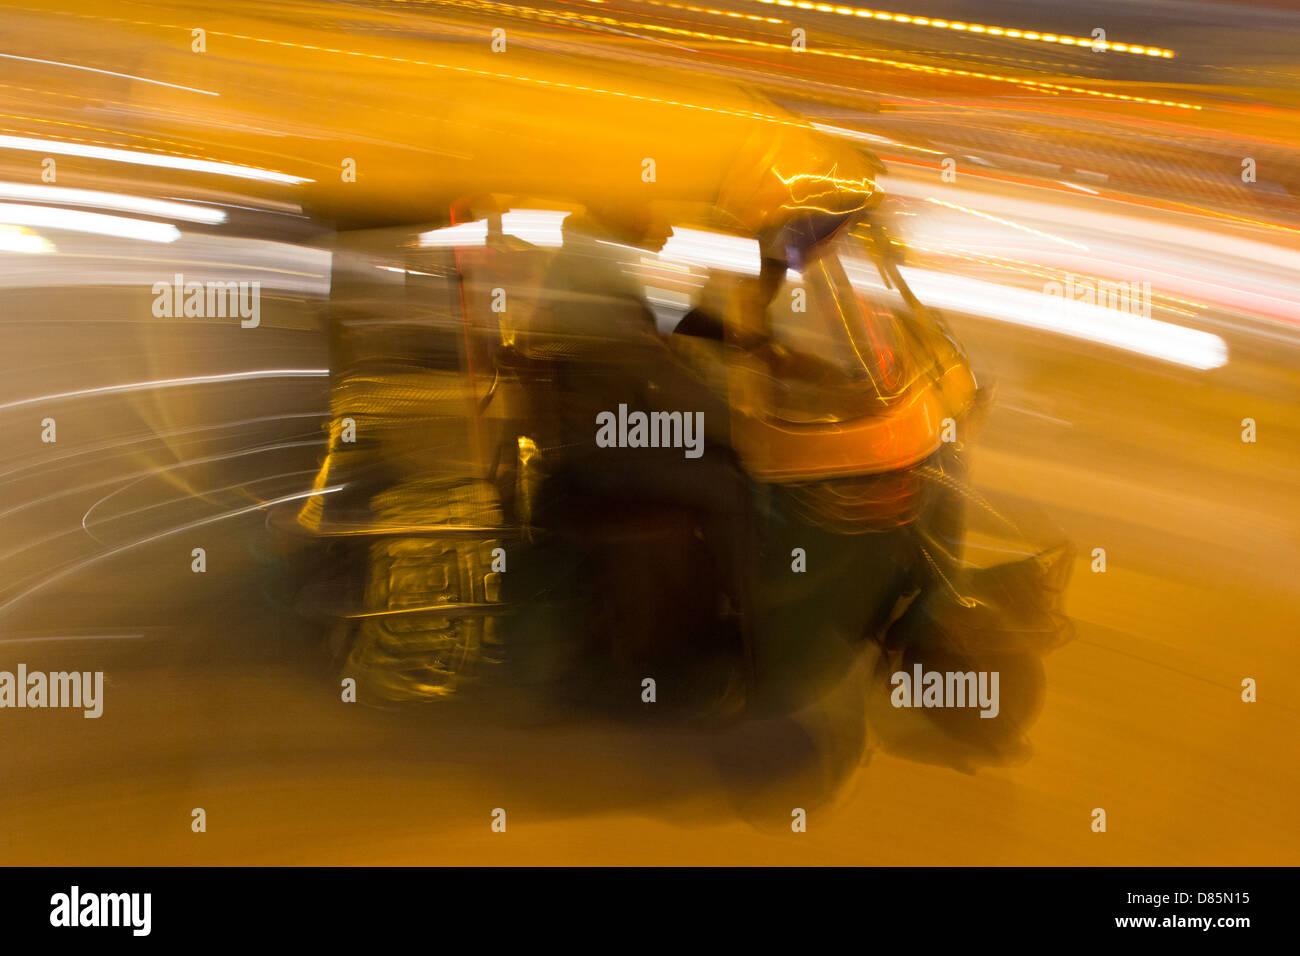 India, Uttar Pradesh, New Delhi, Rickshaw and traffic at night with blurred motion effect - Stock Image